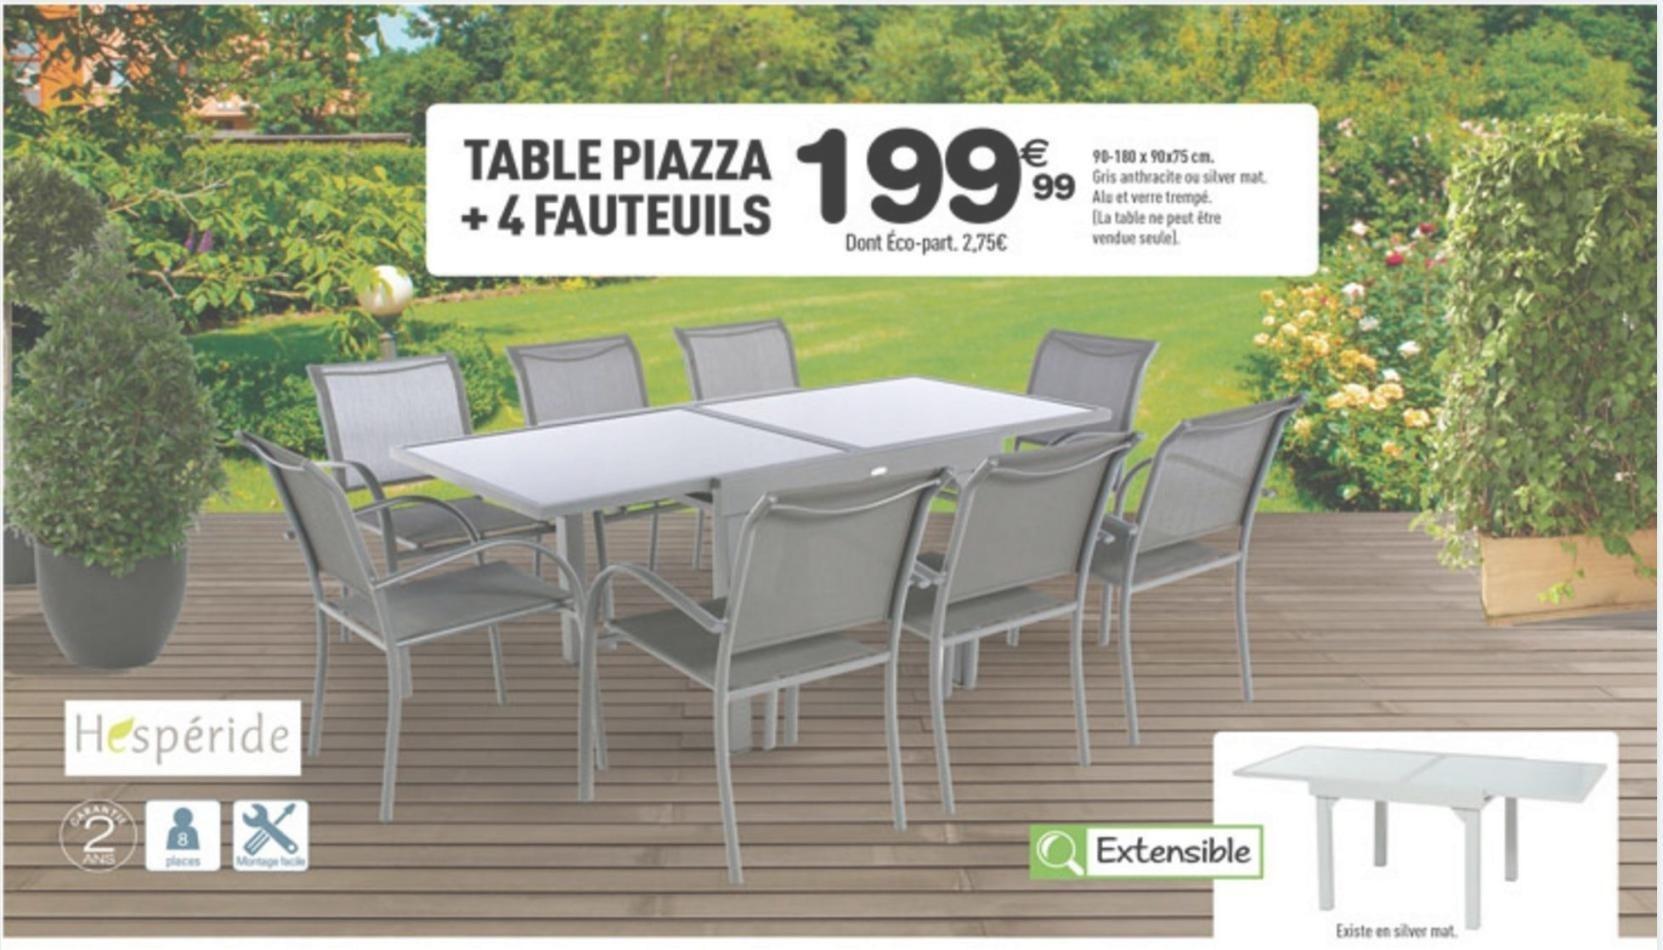 Table Centrakor Table De Table Centrakor De Hesperide ... avec Hesperide Meuble Jardin